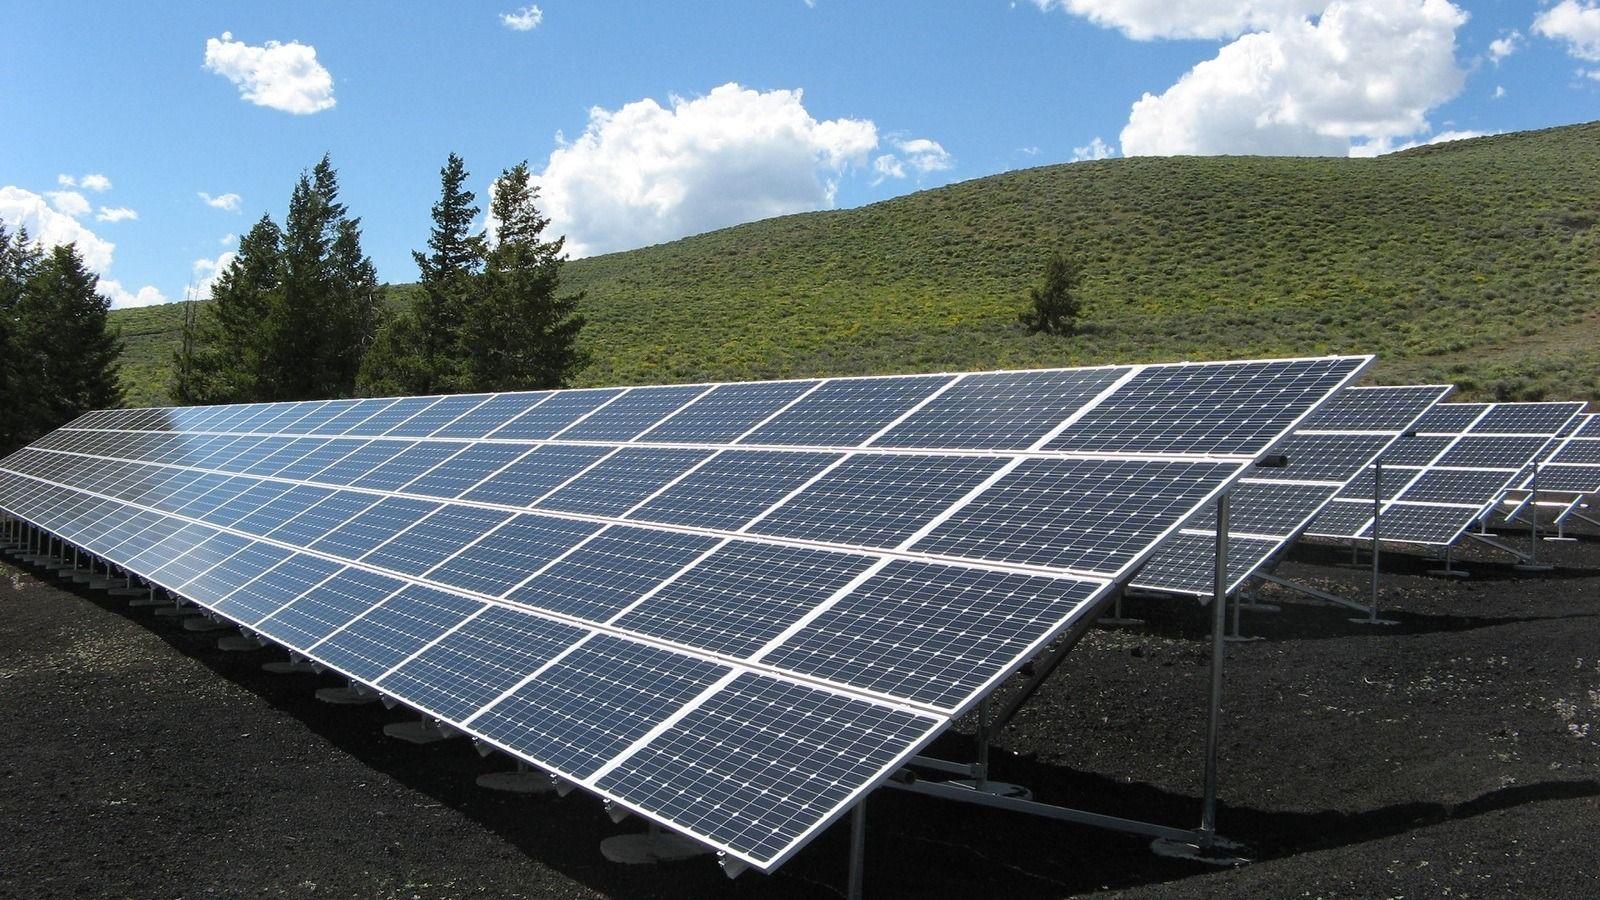 Australian Billionaires Invest In A Massive 15 000 Hectare Solar Farm In 2020 Green Energy Solar Solar Energy System Solar